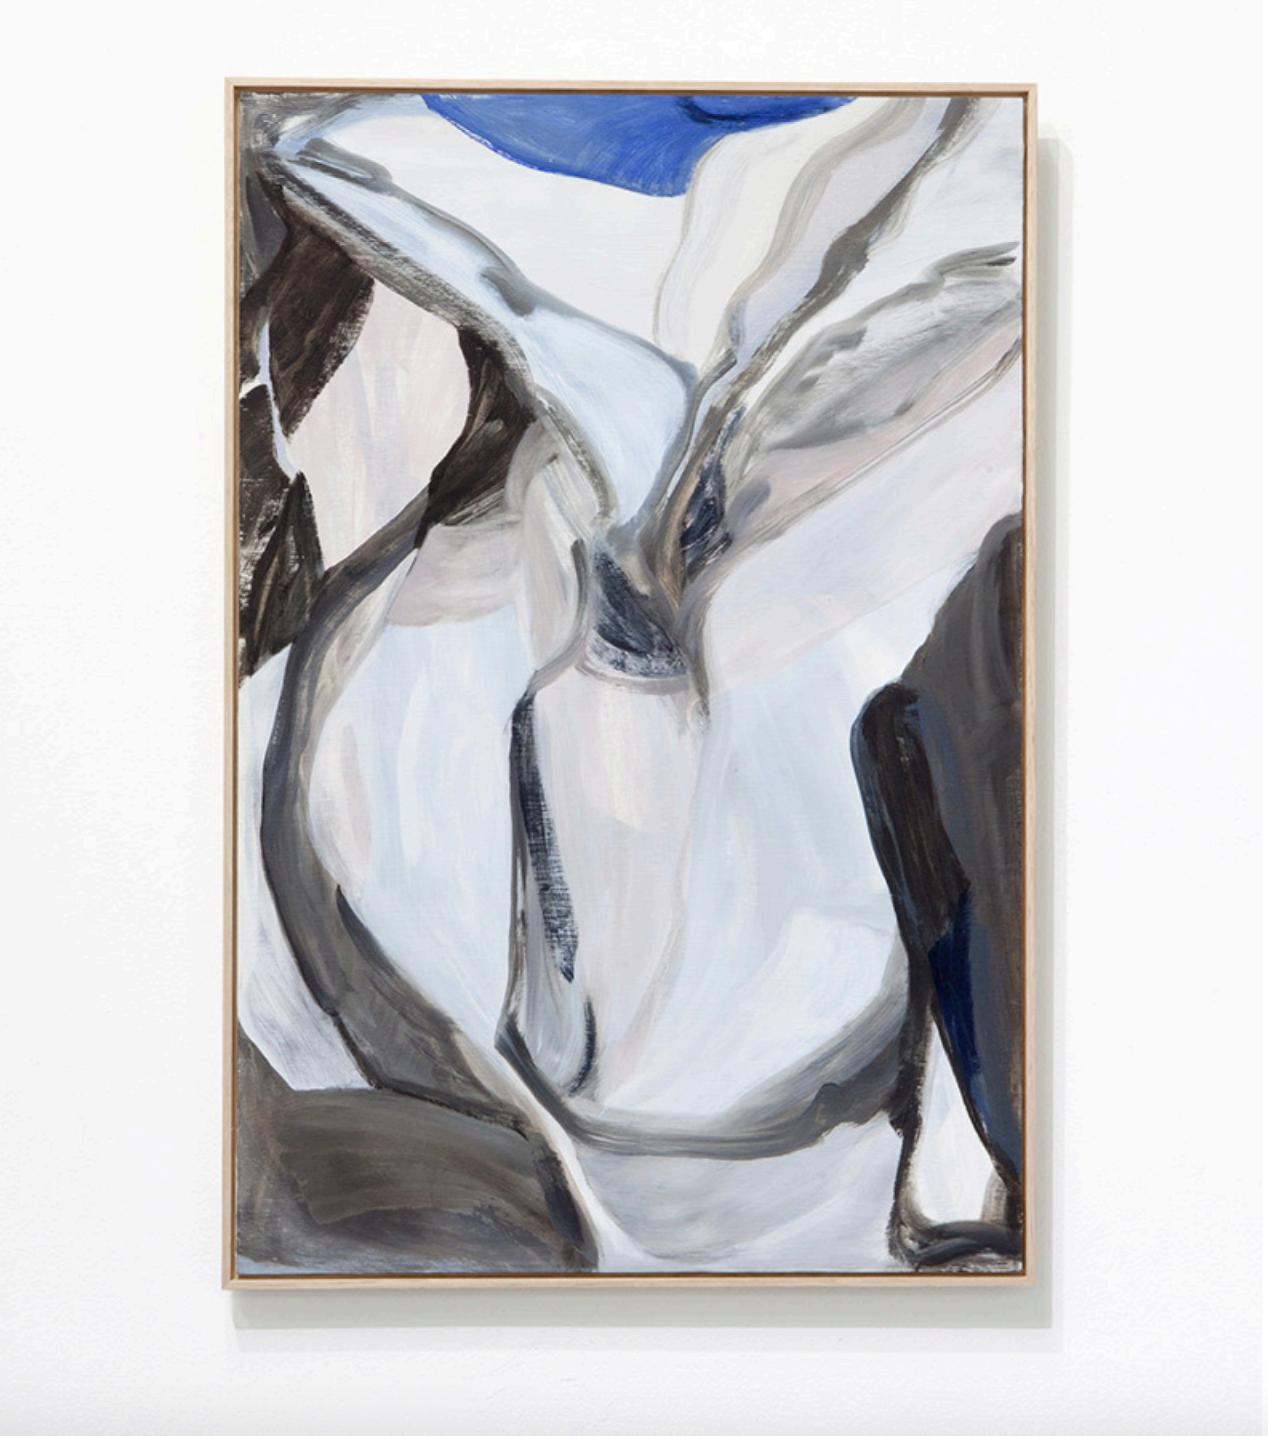 Untitled (DAF), 2017, Oil on Board